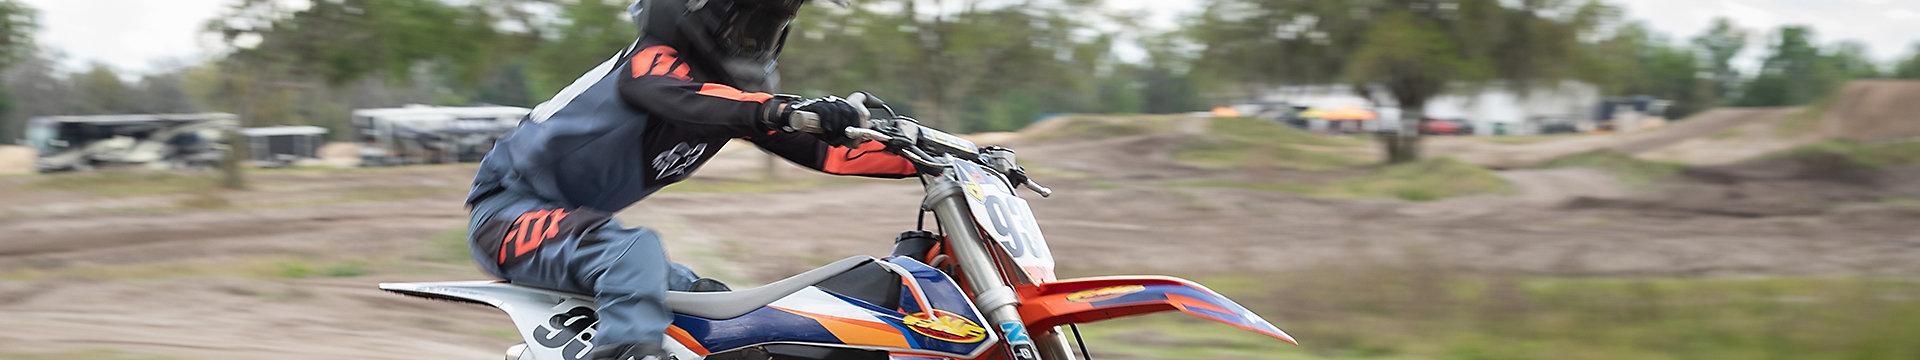 Fox Motocross Camisolas